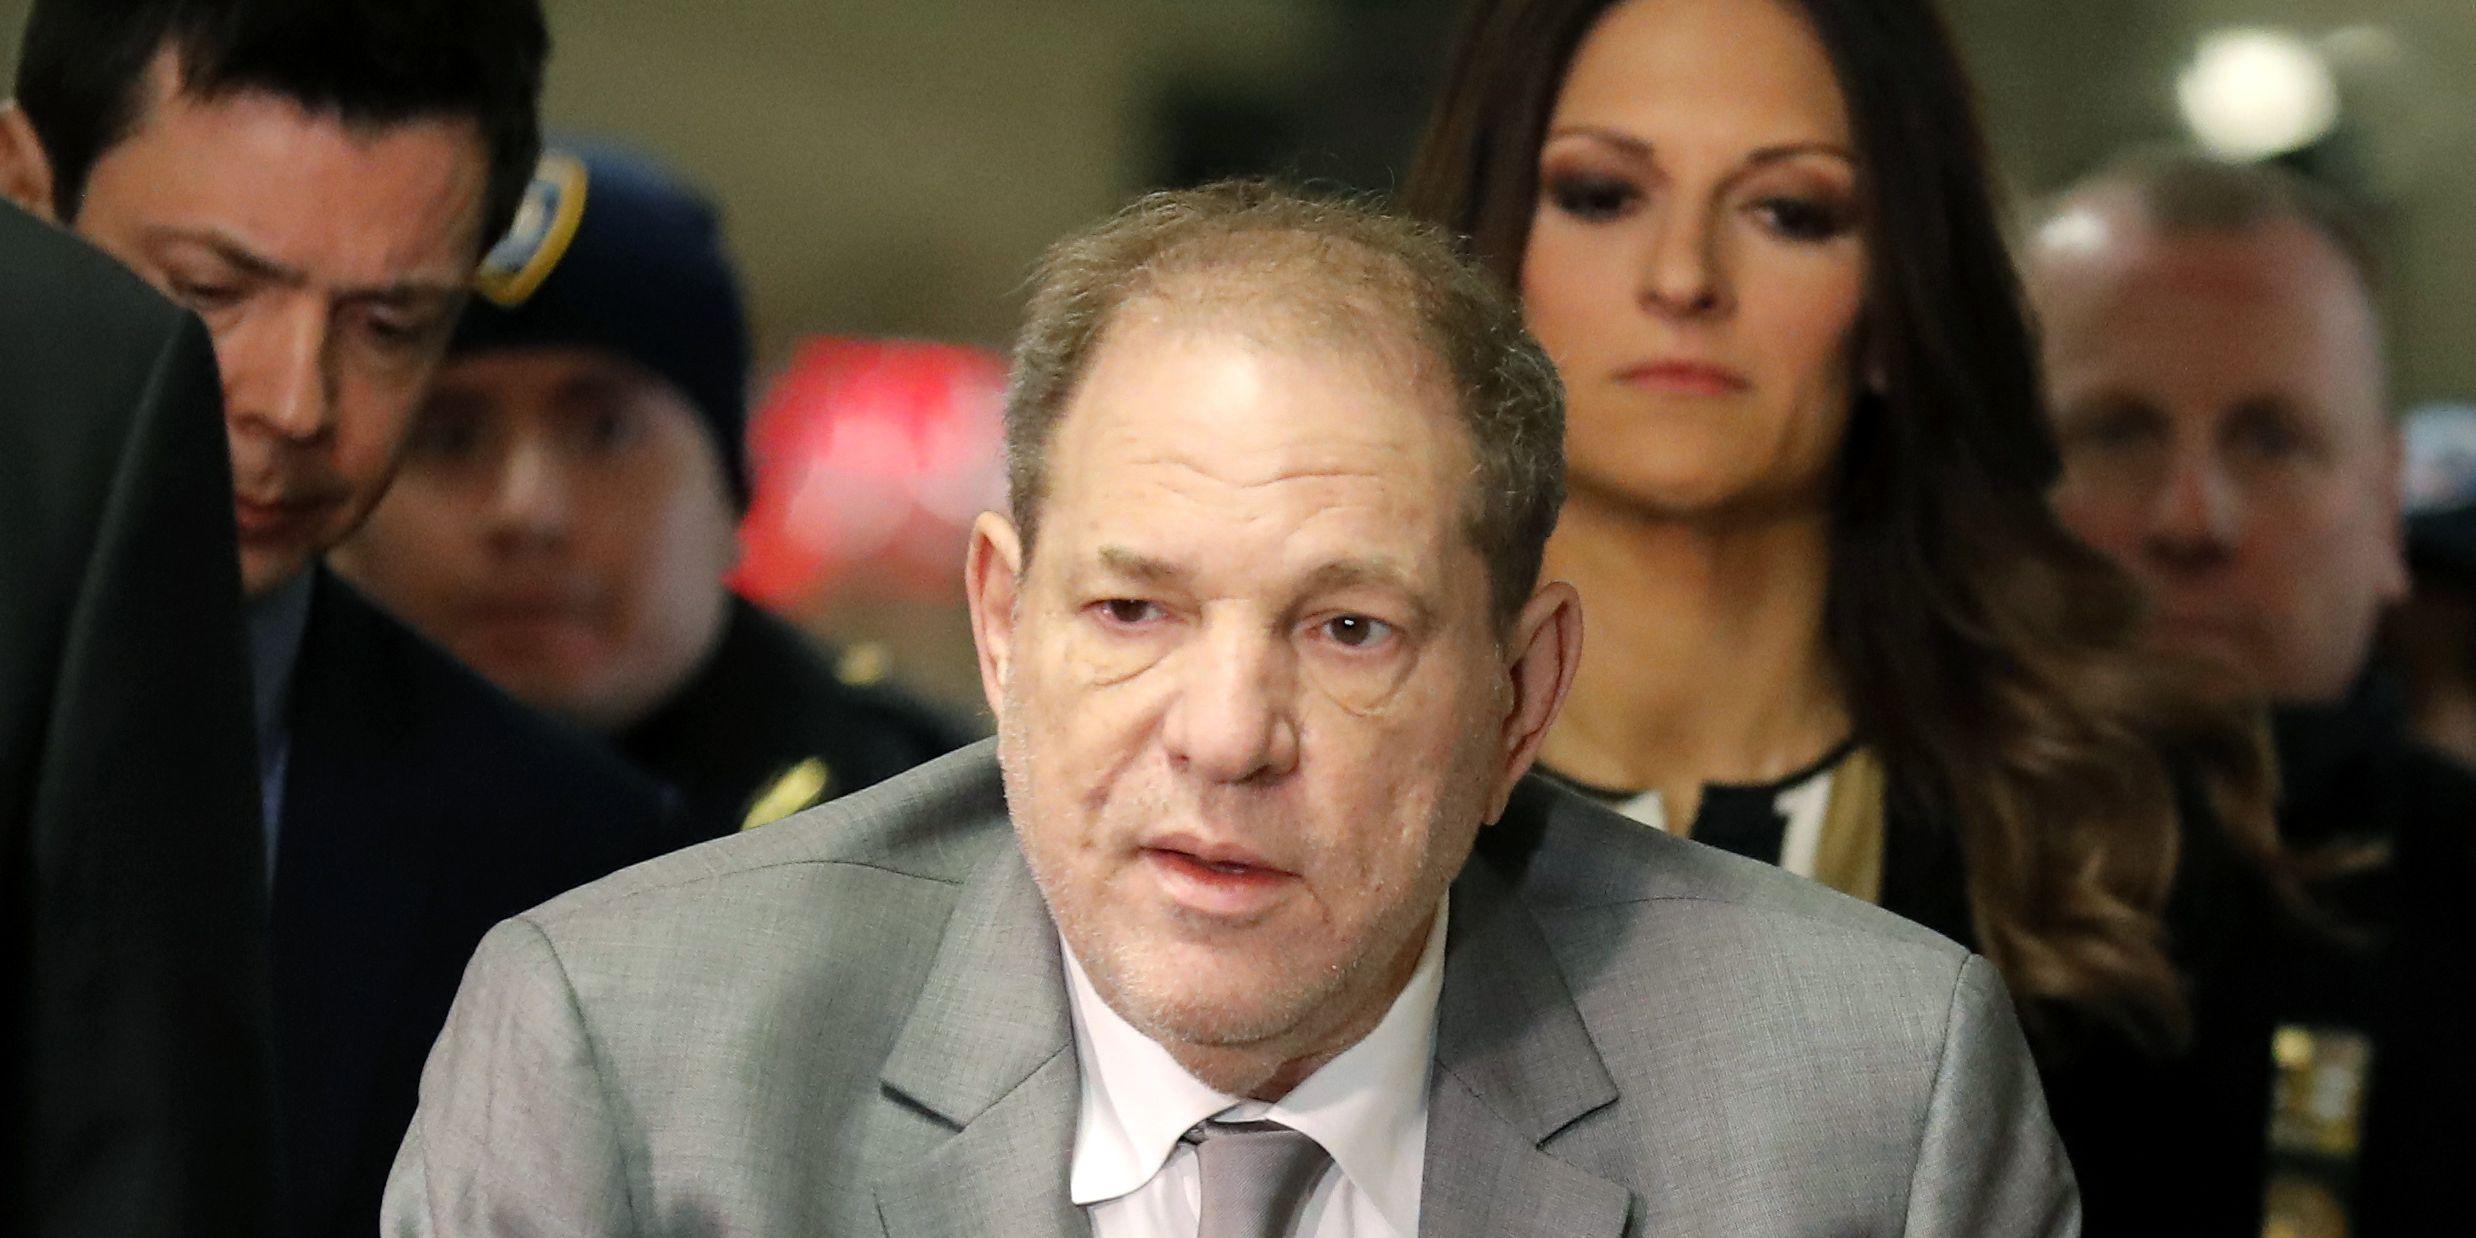 Weinstein rape trial opens, marking milestone for #MeToo